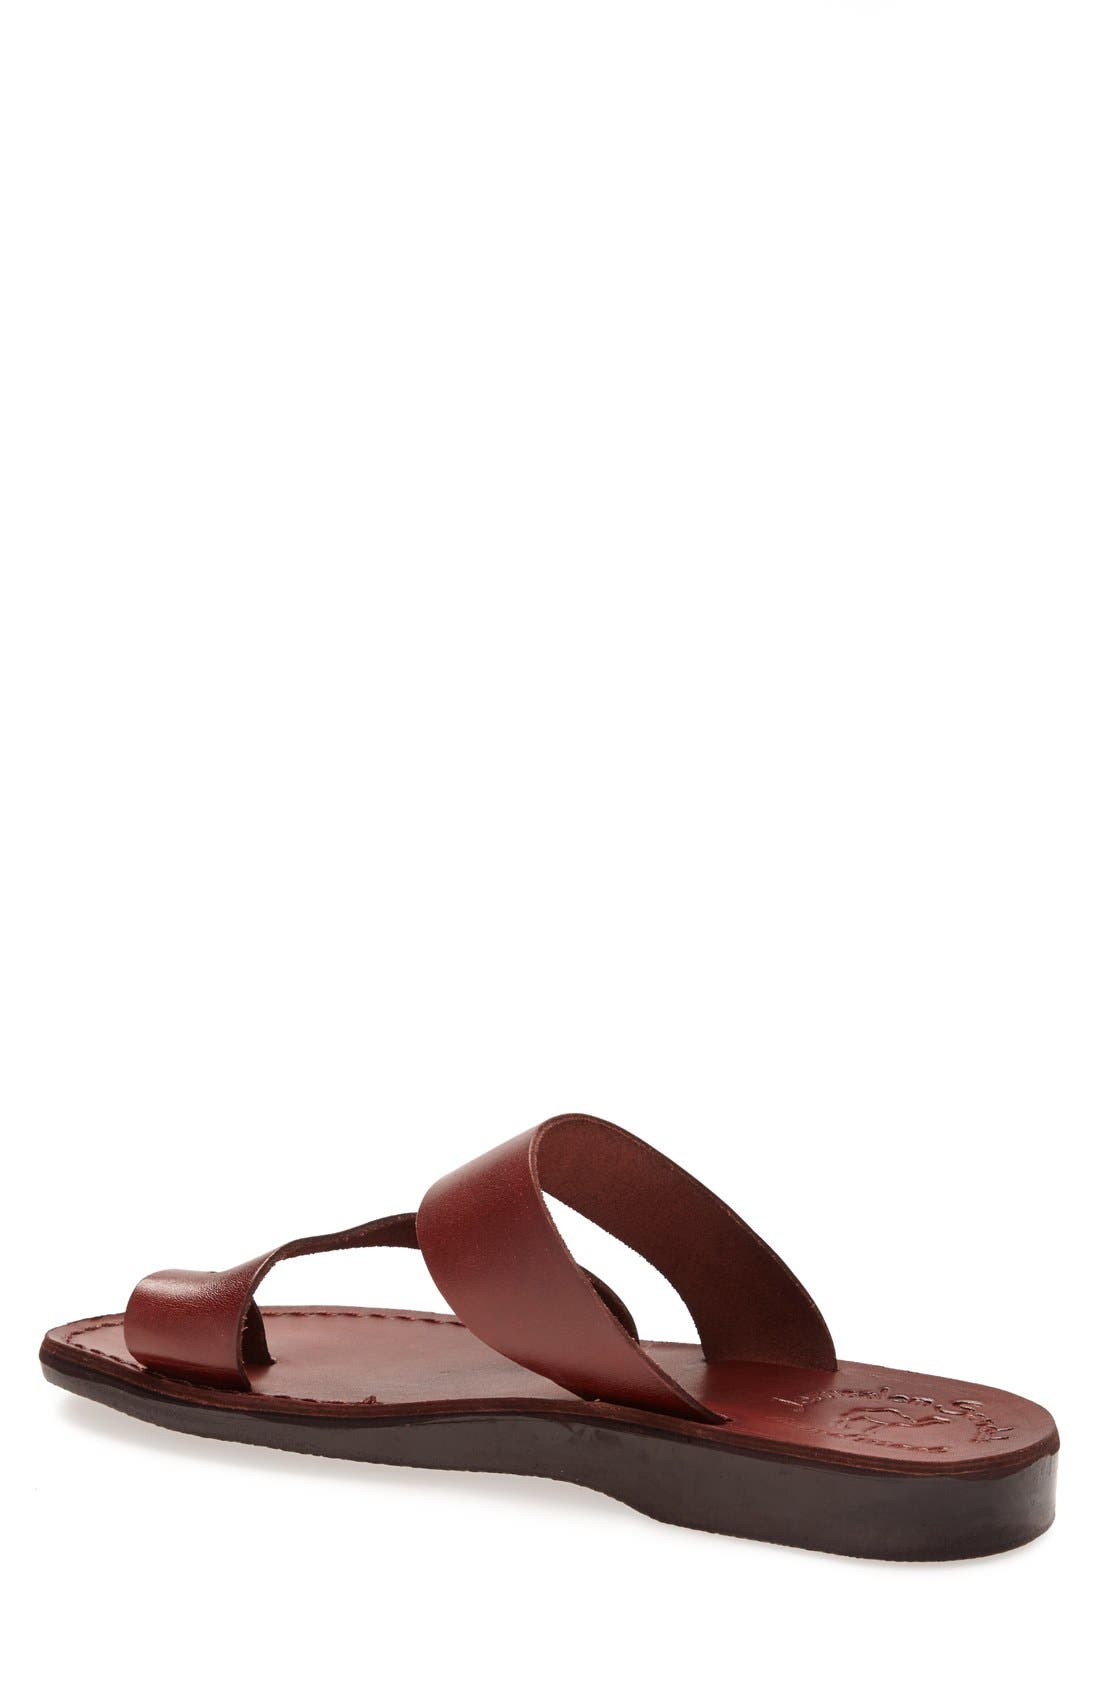 'Zohar' Leather Sandal,                             Alternate thumbnail 2, color,                             BROWN